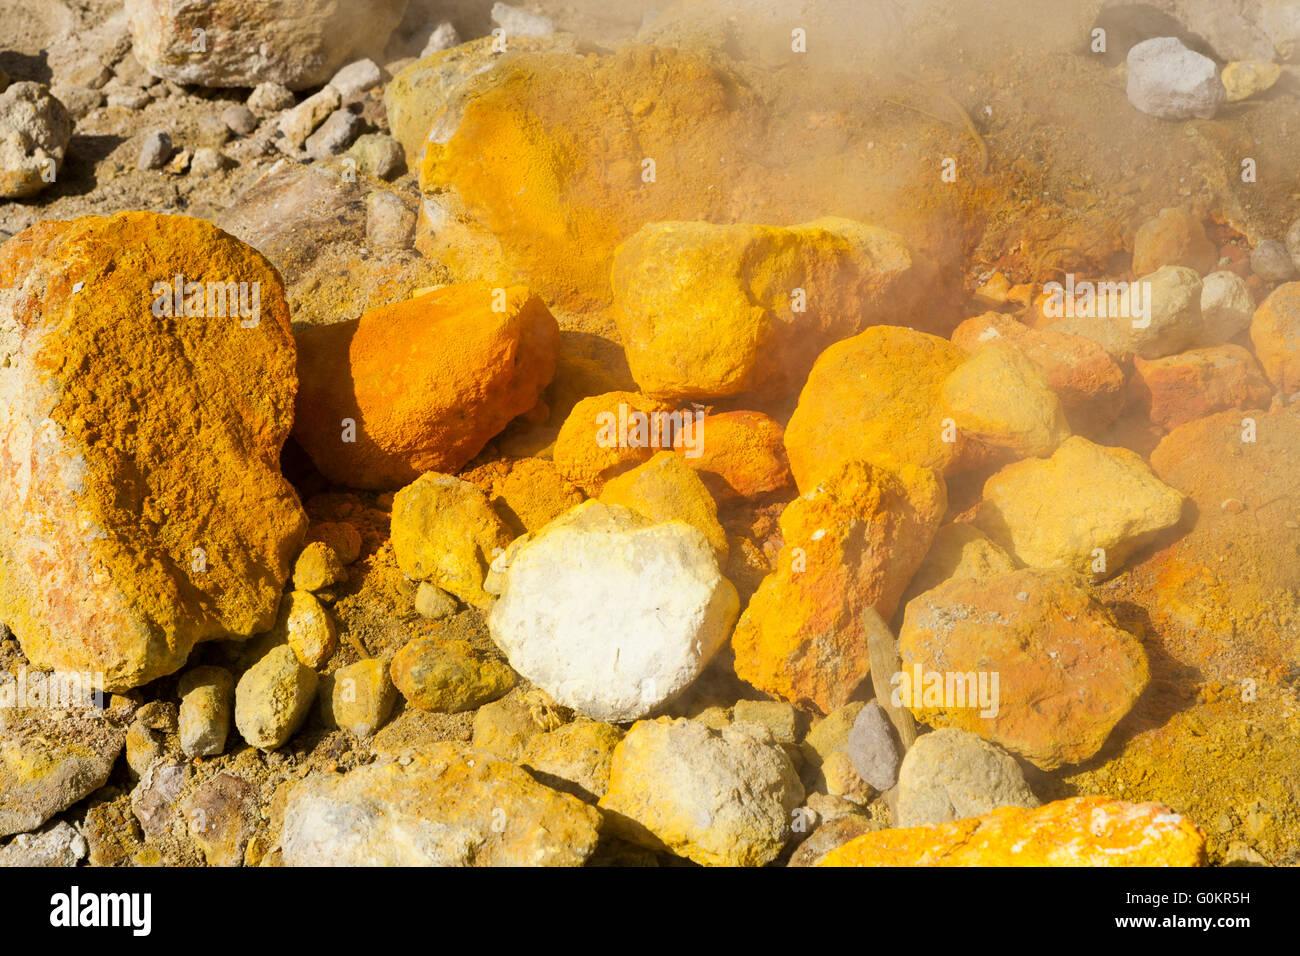 Solfatara volcano. Steam & sulfurous fumes rise from fumerole / fumeroles. Pozzuoli nr Naples Italy; Campi Flegrei - Stock Image